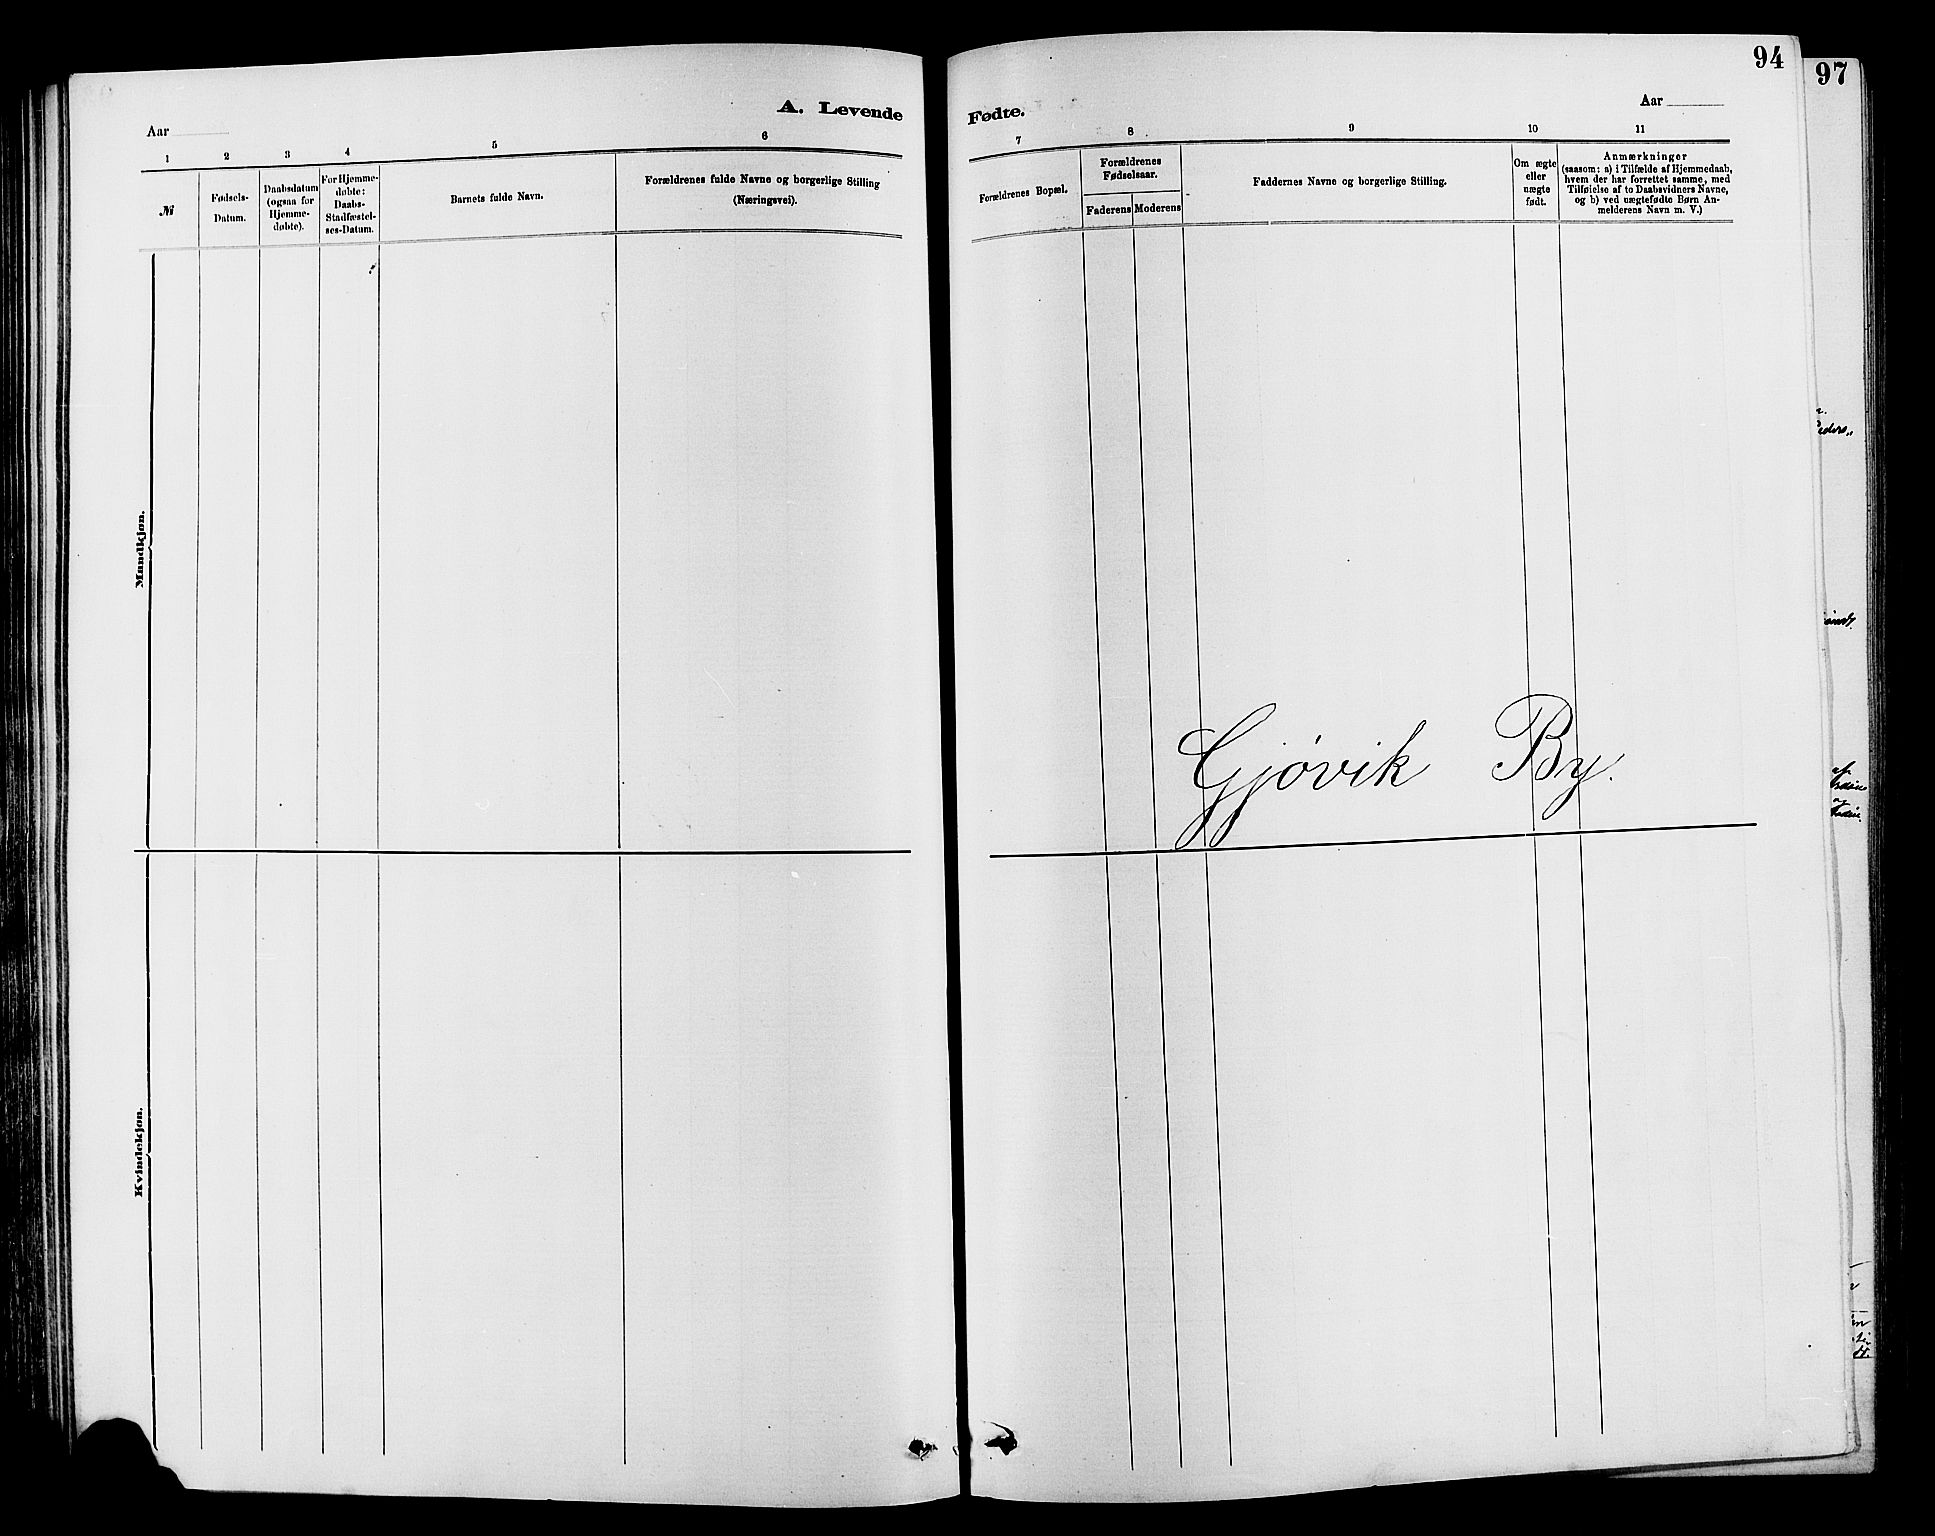 SAH, Vardal prestekontor, H/Ha/Hab/L0007: Klokkerbok nr. 7 /2, 1881-1895, s. 94